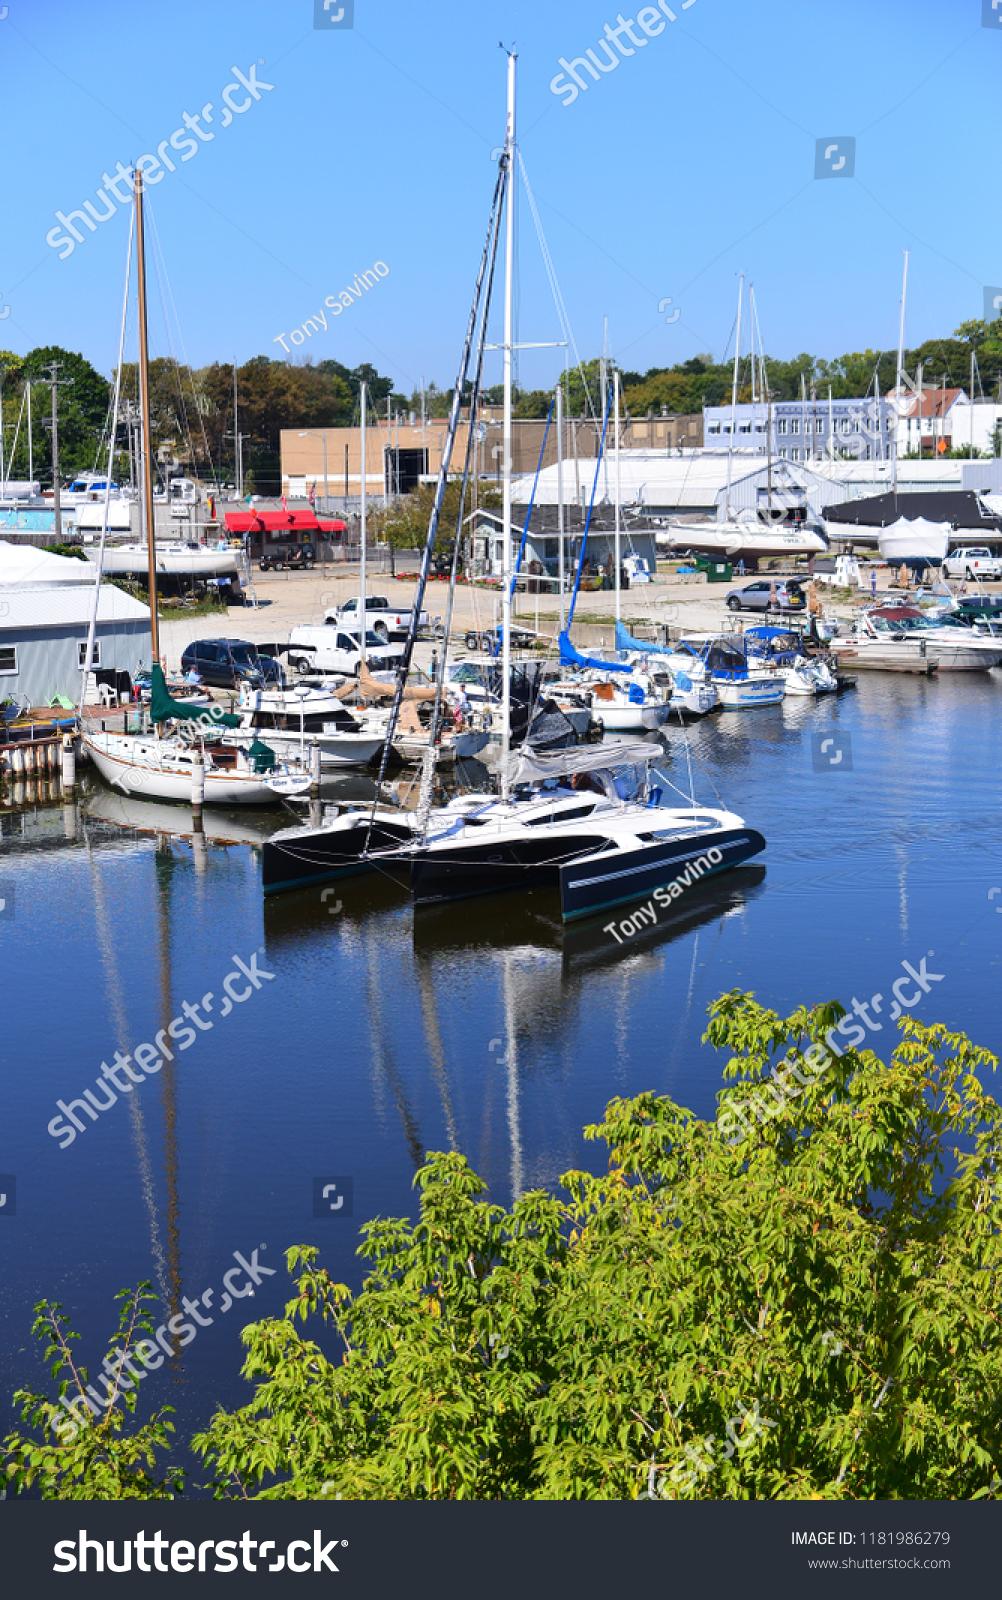 stock-photo-racine-wisconsin-usa-september-a-beautiful-three-pontoon-sailboat-named-penelope-1181986279.jpg